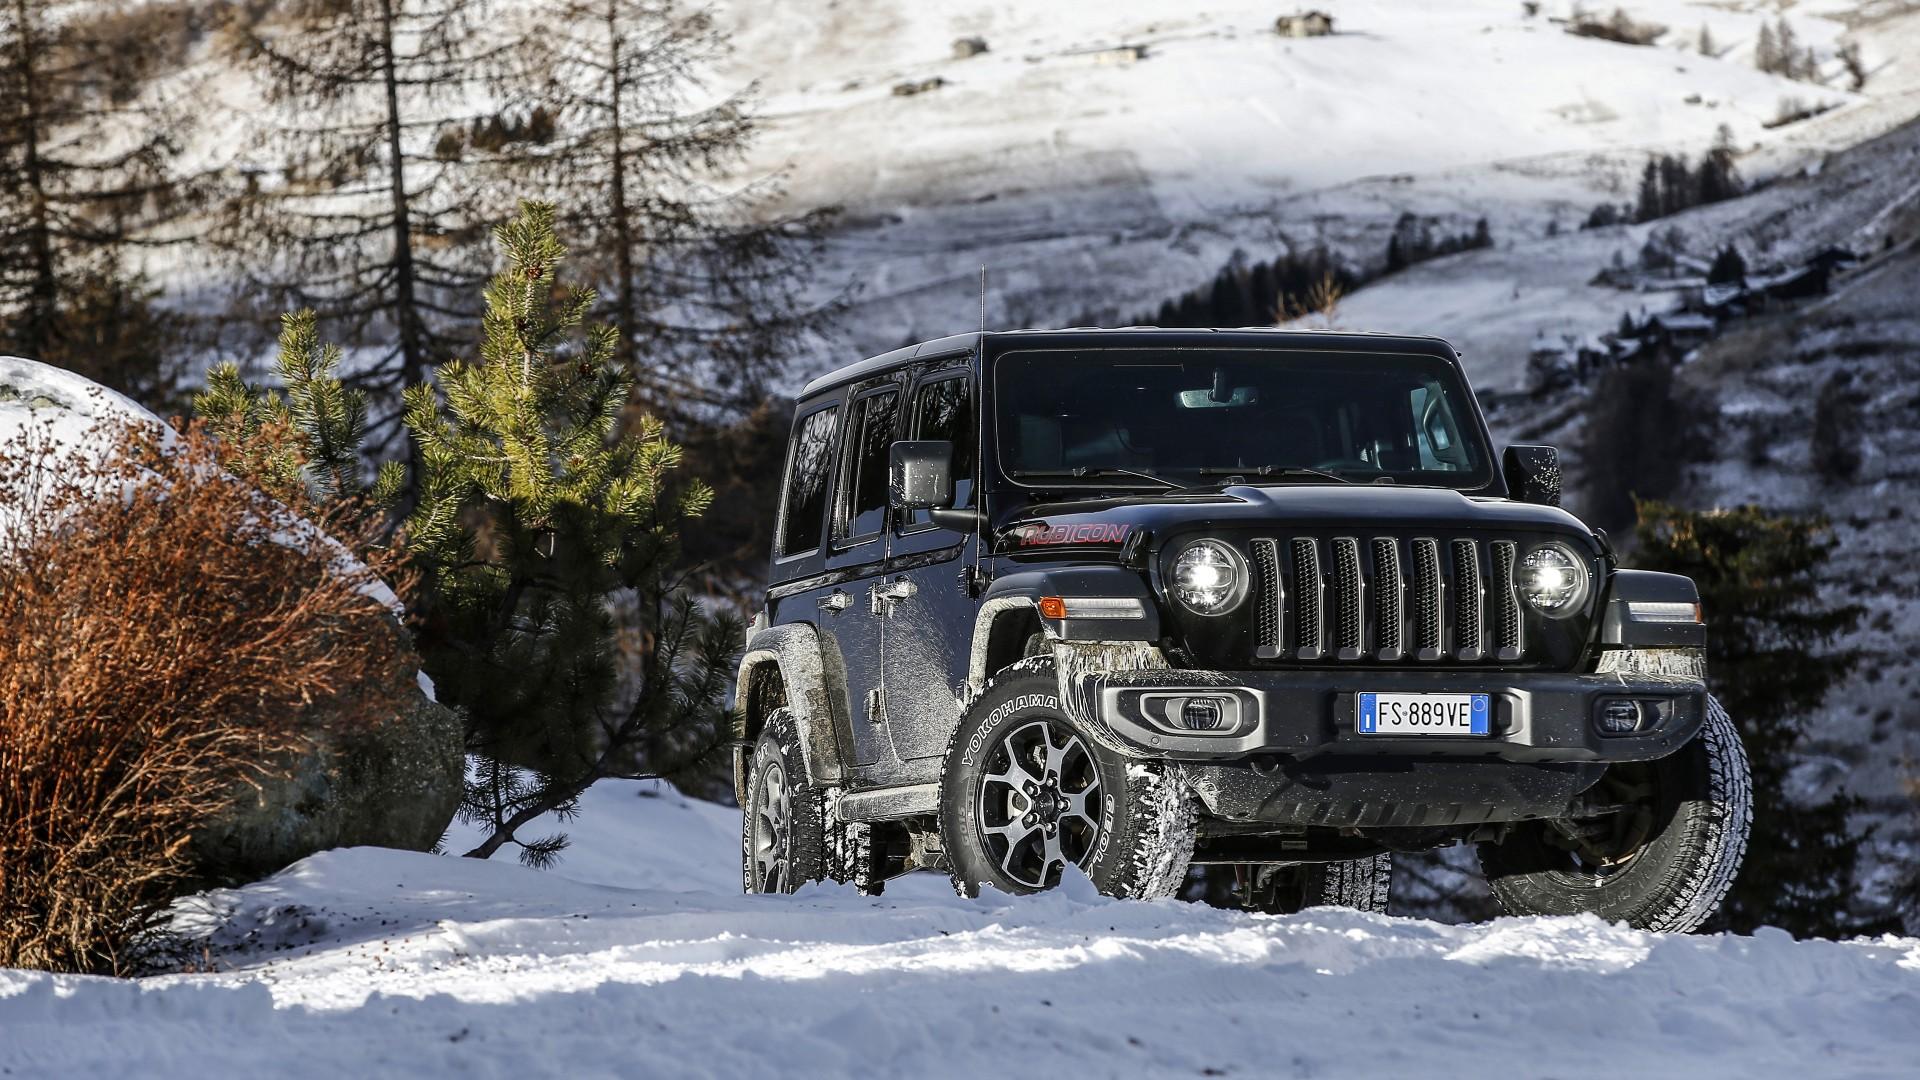 Jeep Wrangler Rubicon X >> Jeep Wrangler Unlimited Rubicon 2019 4K Wallpaper | HD Car Wallpapers | ID #11748